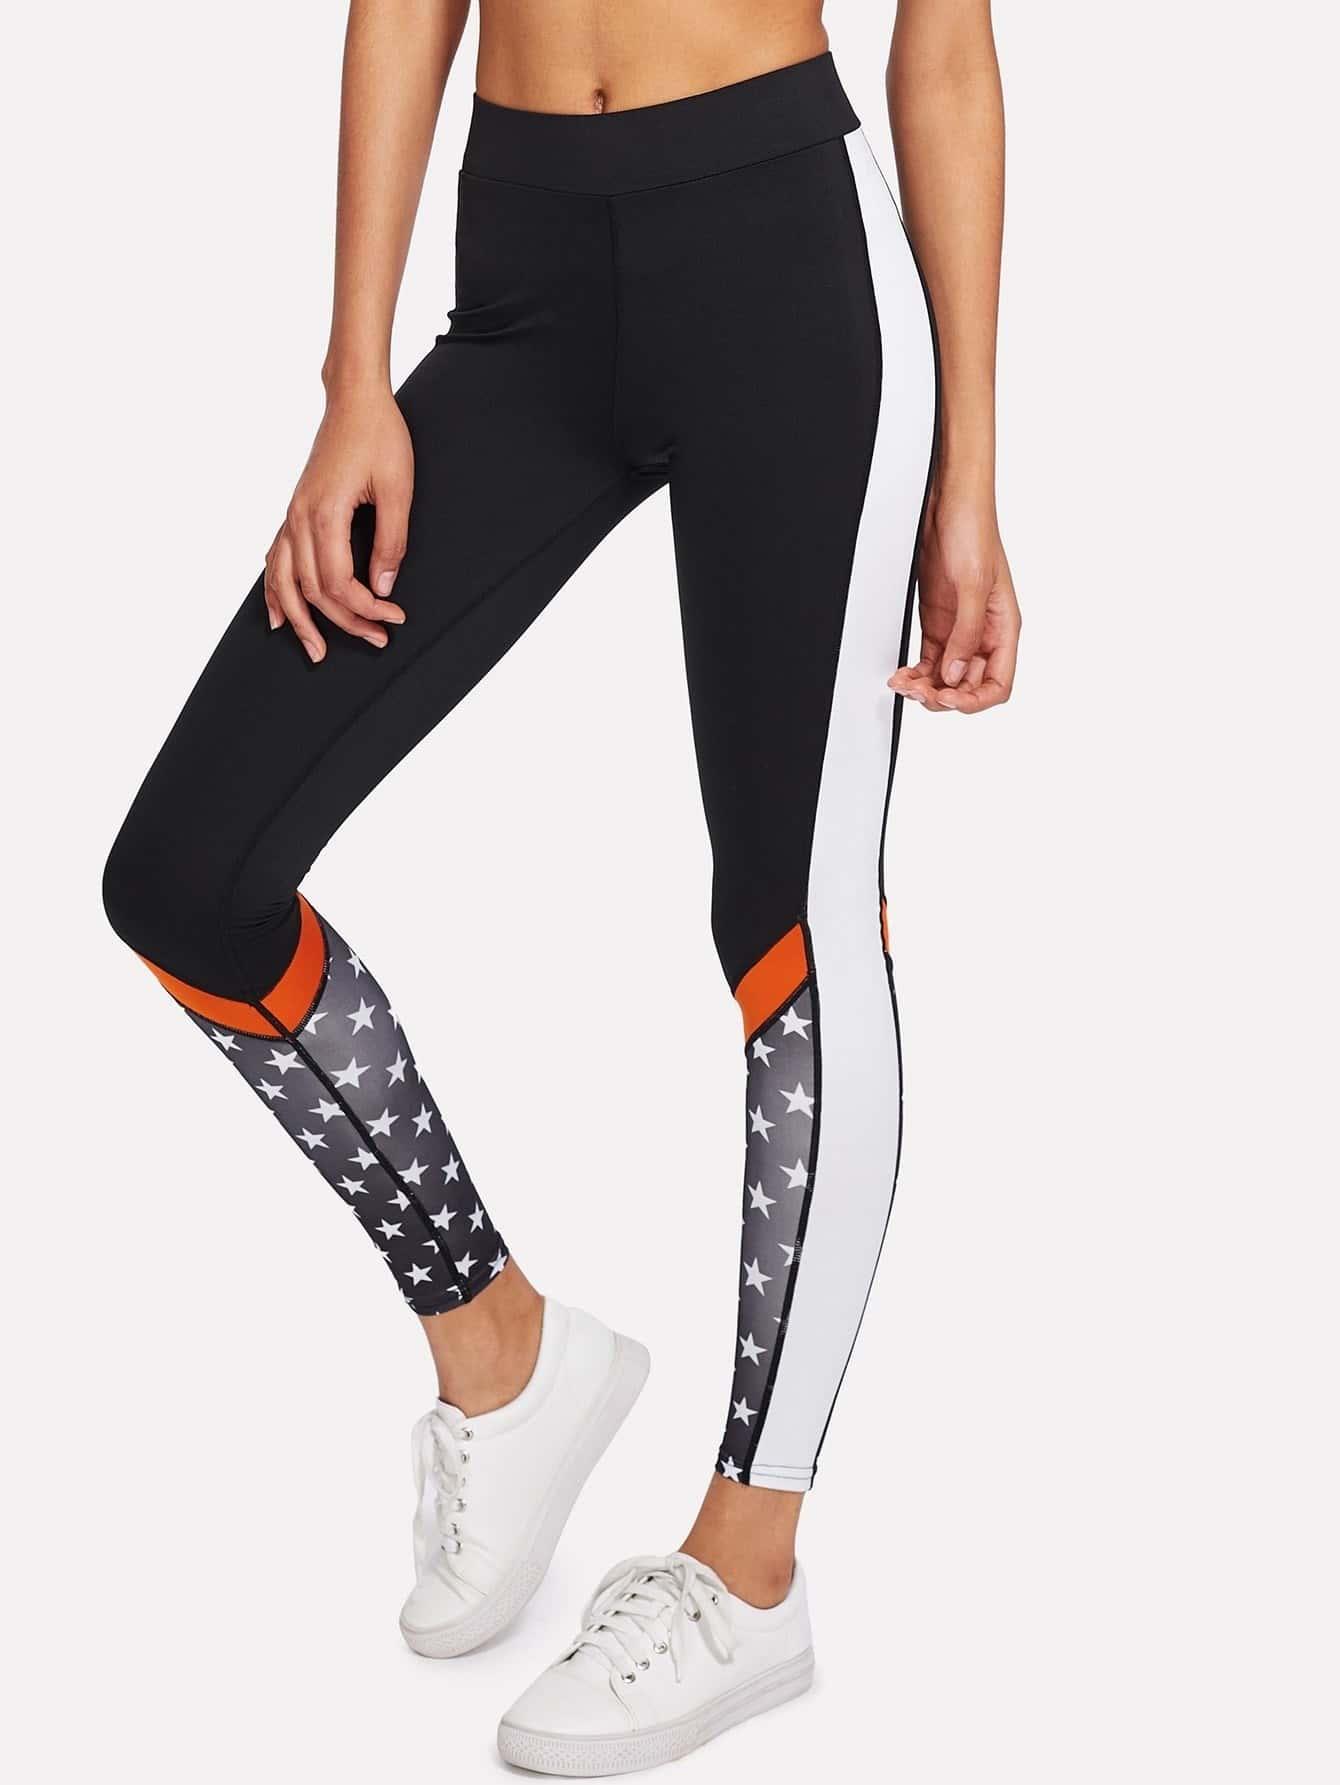 Contrast Panel Side Printed Leggings leopard panel side leggings